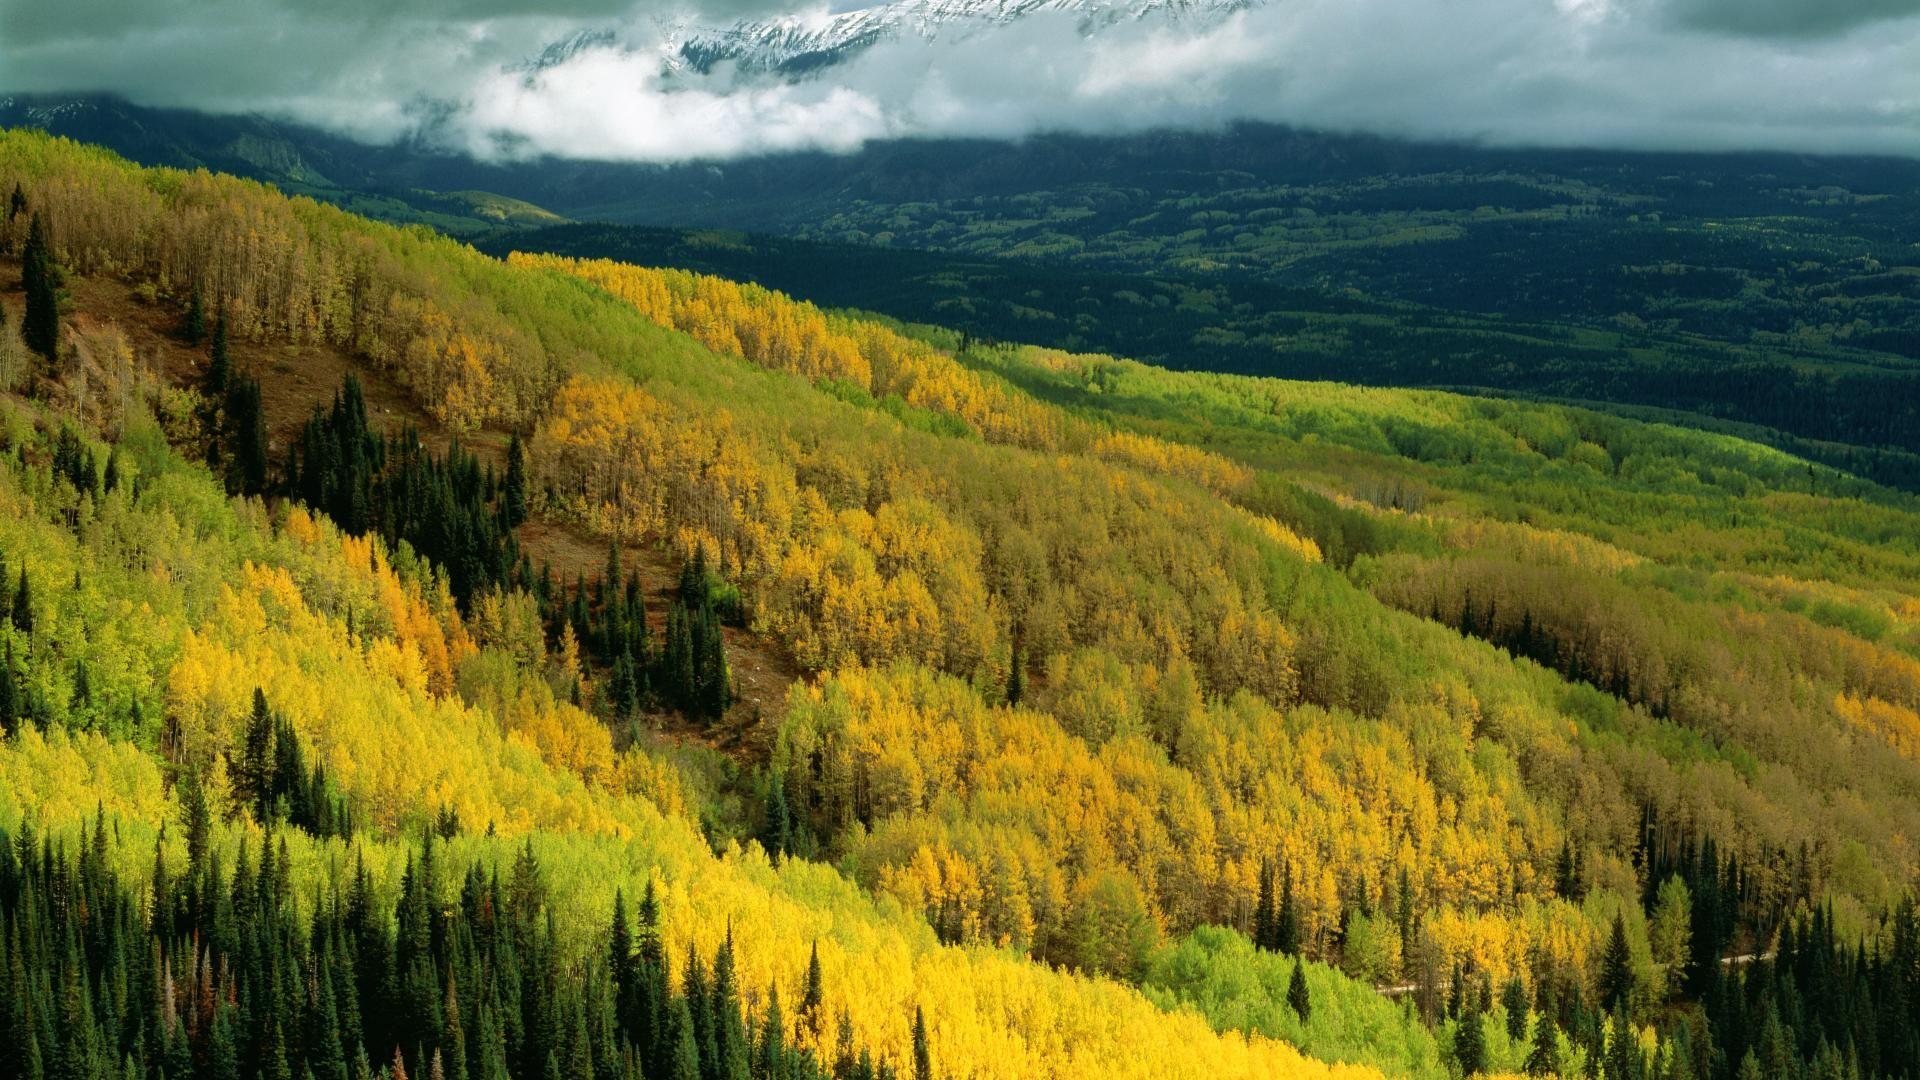 Aspen Forest In Early Fall Ohio Pass Gunnison National Forest Colorado Belle Nature Fond Ecran Nature Fond Ecran Automne